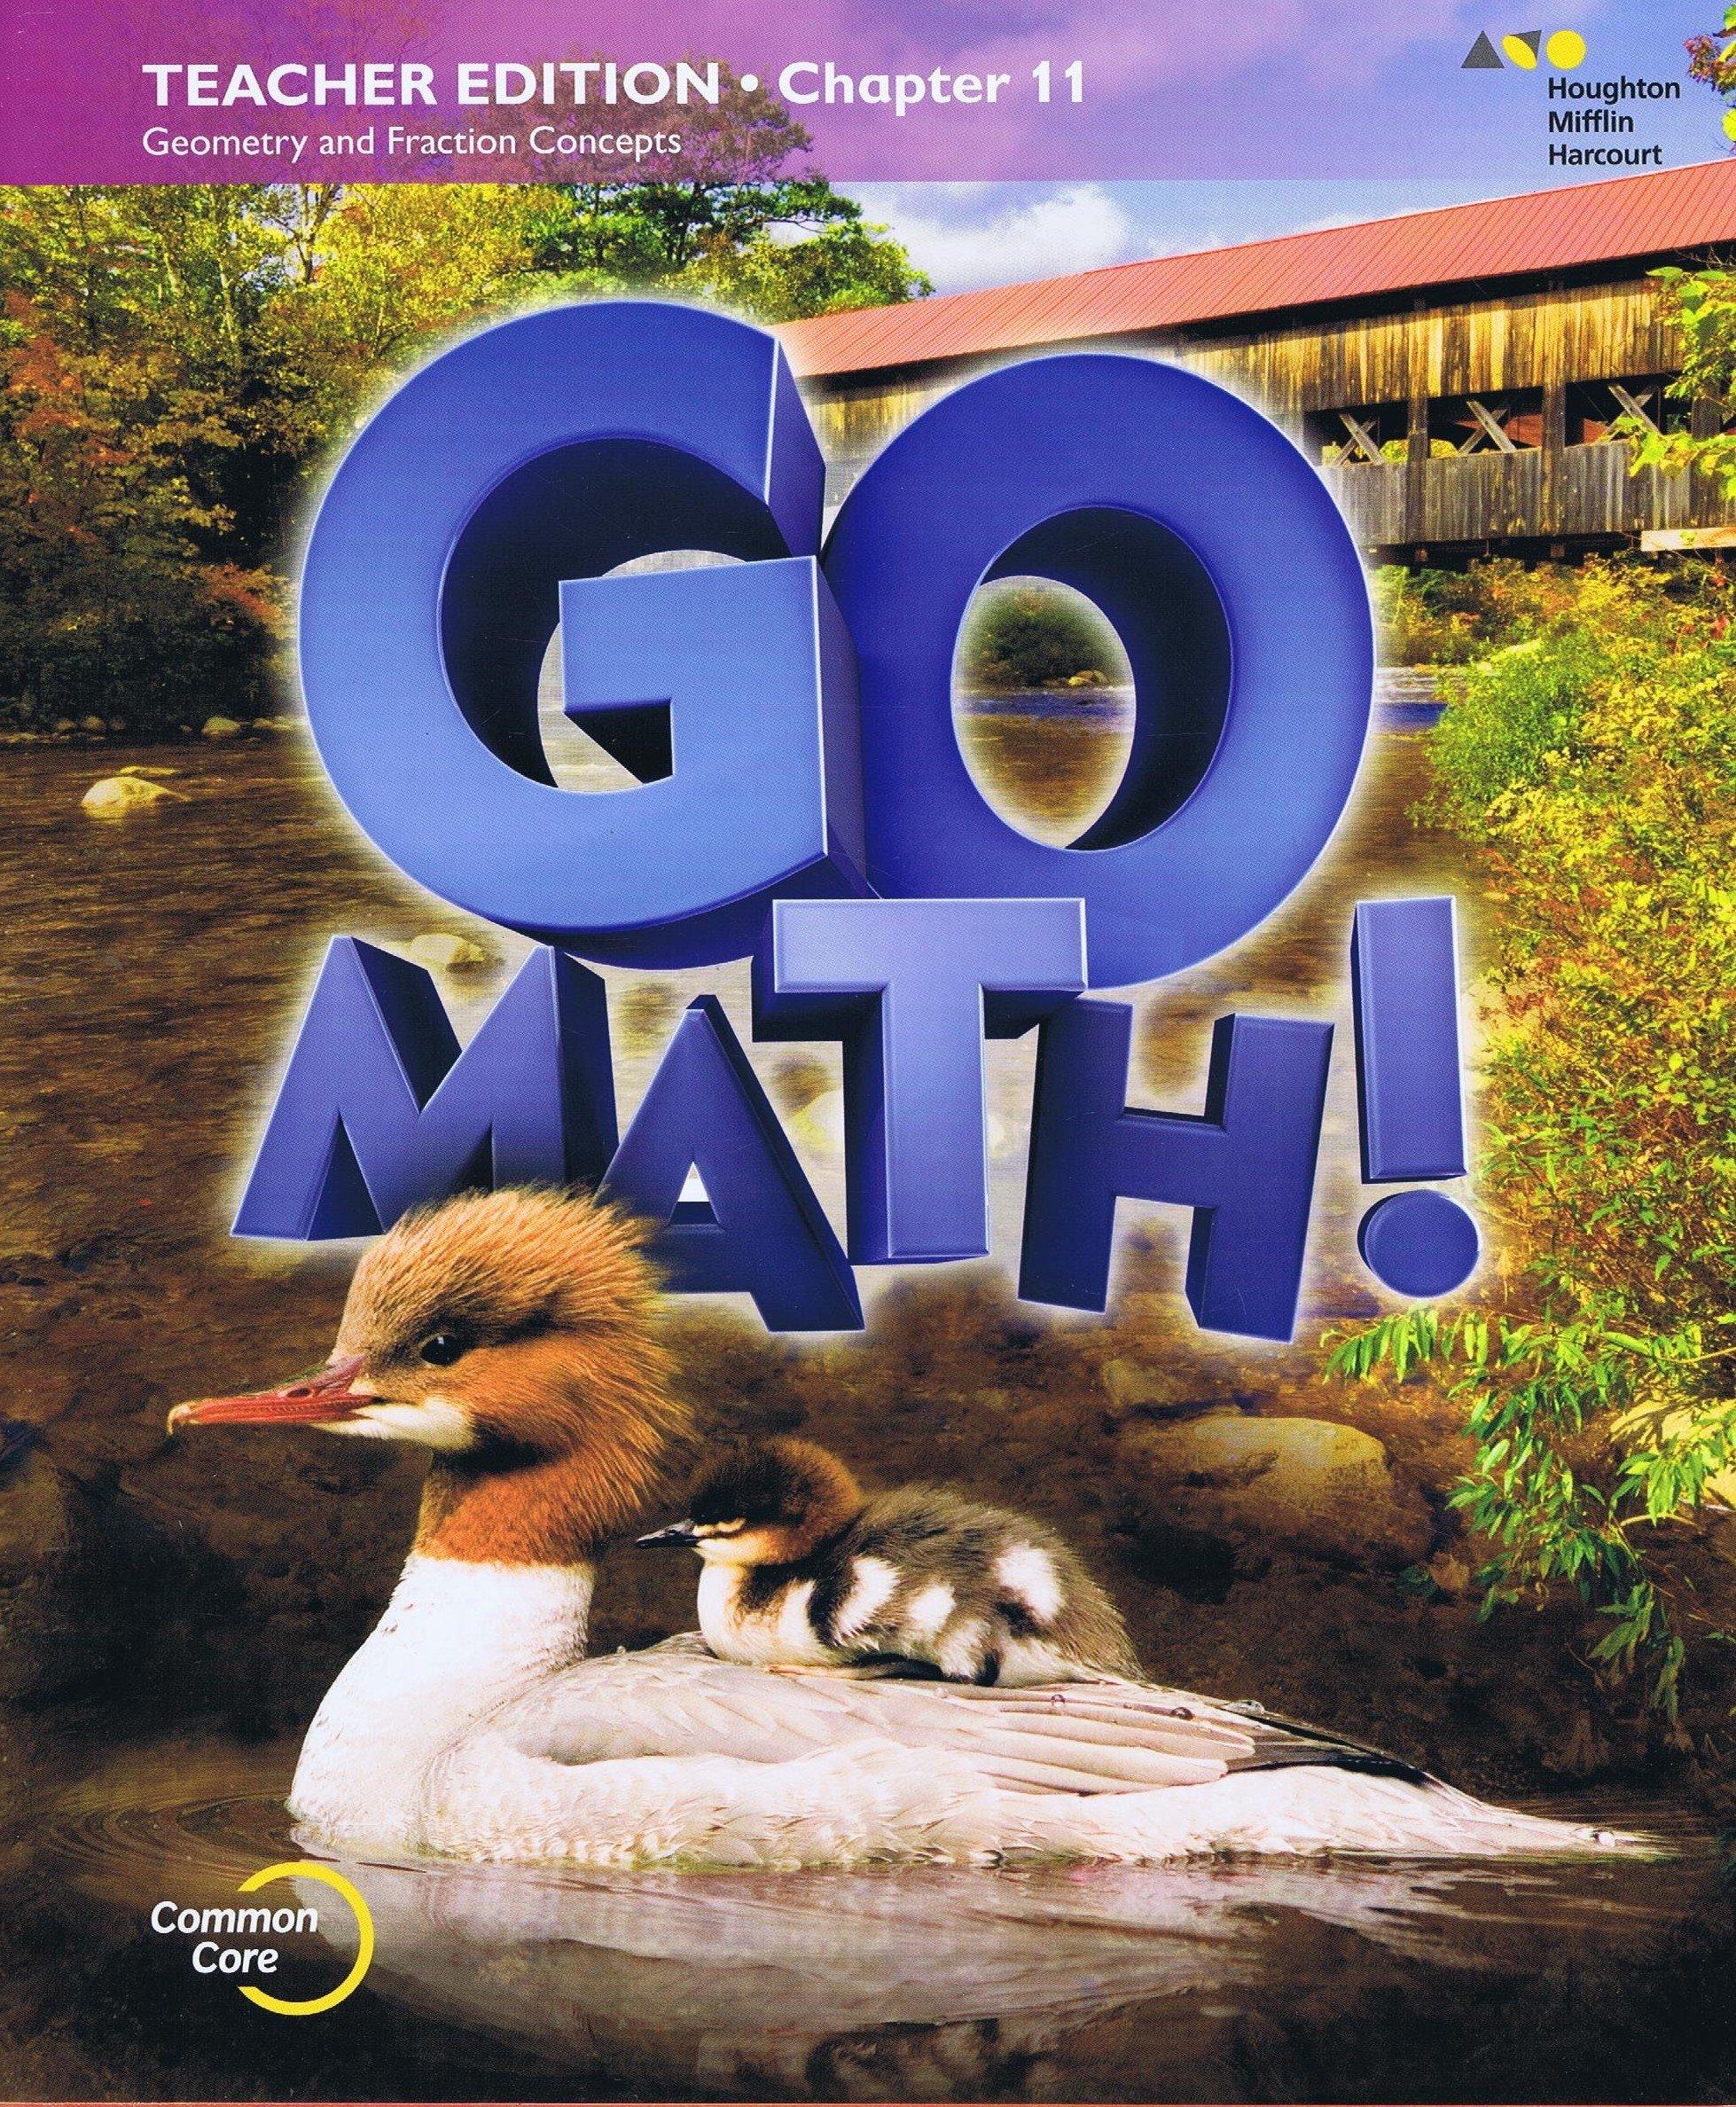 Go math grade 2 teachers edition chapter 11 geometry and fraction go math grade 2 teachers edition chapter 11 geometry and fraction concepts hmh 9780544295865 amazon books fandeluxe Gallery